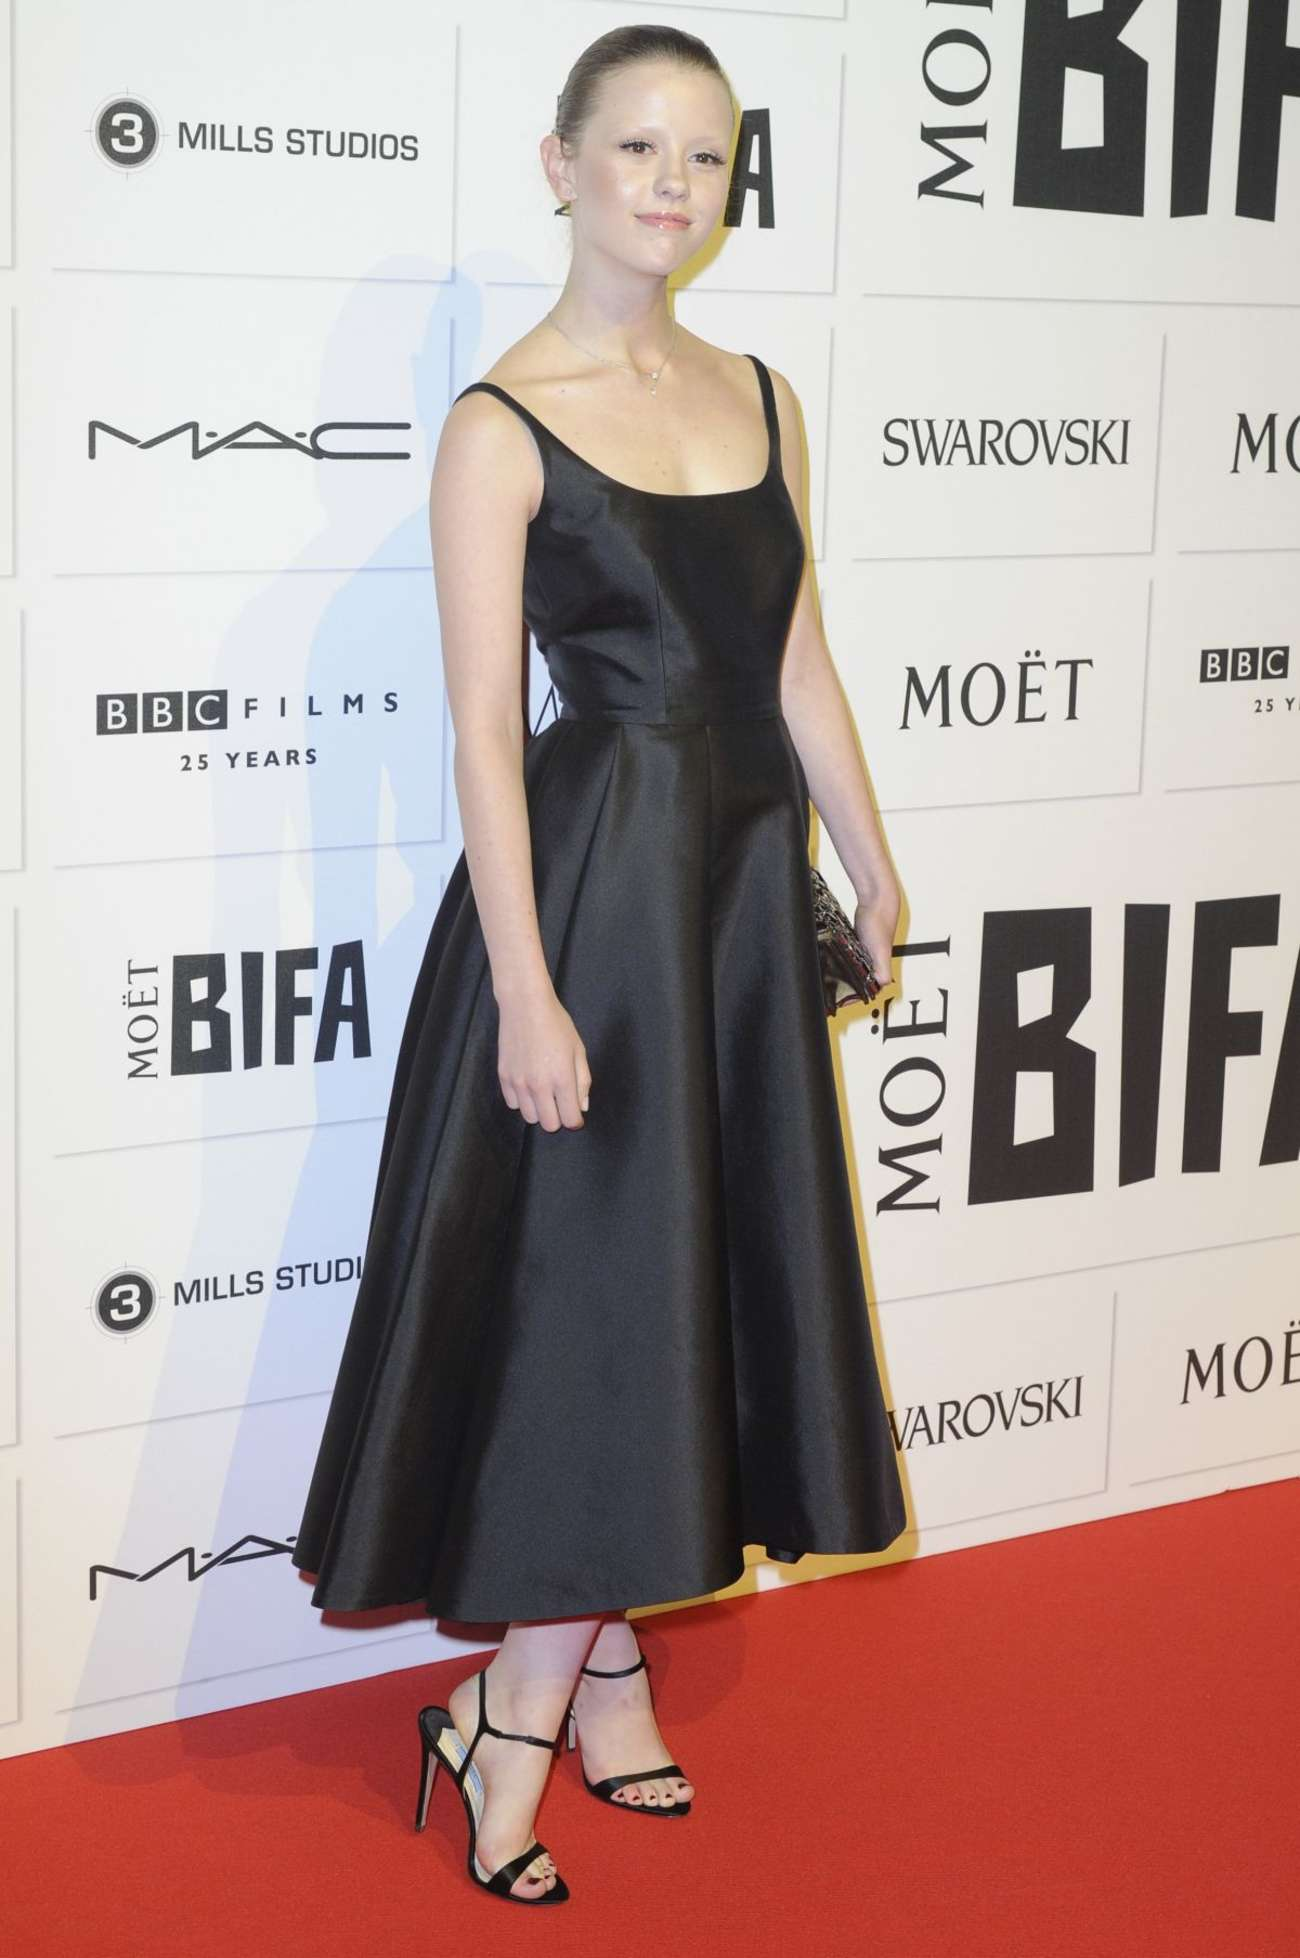 Mia Goth Moet British Independent Film Awards in London